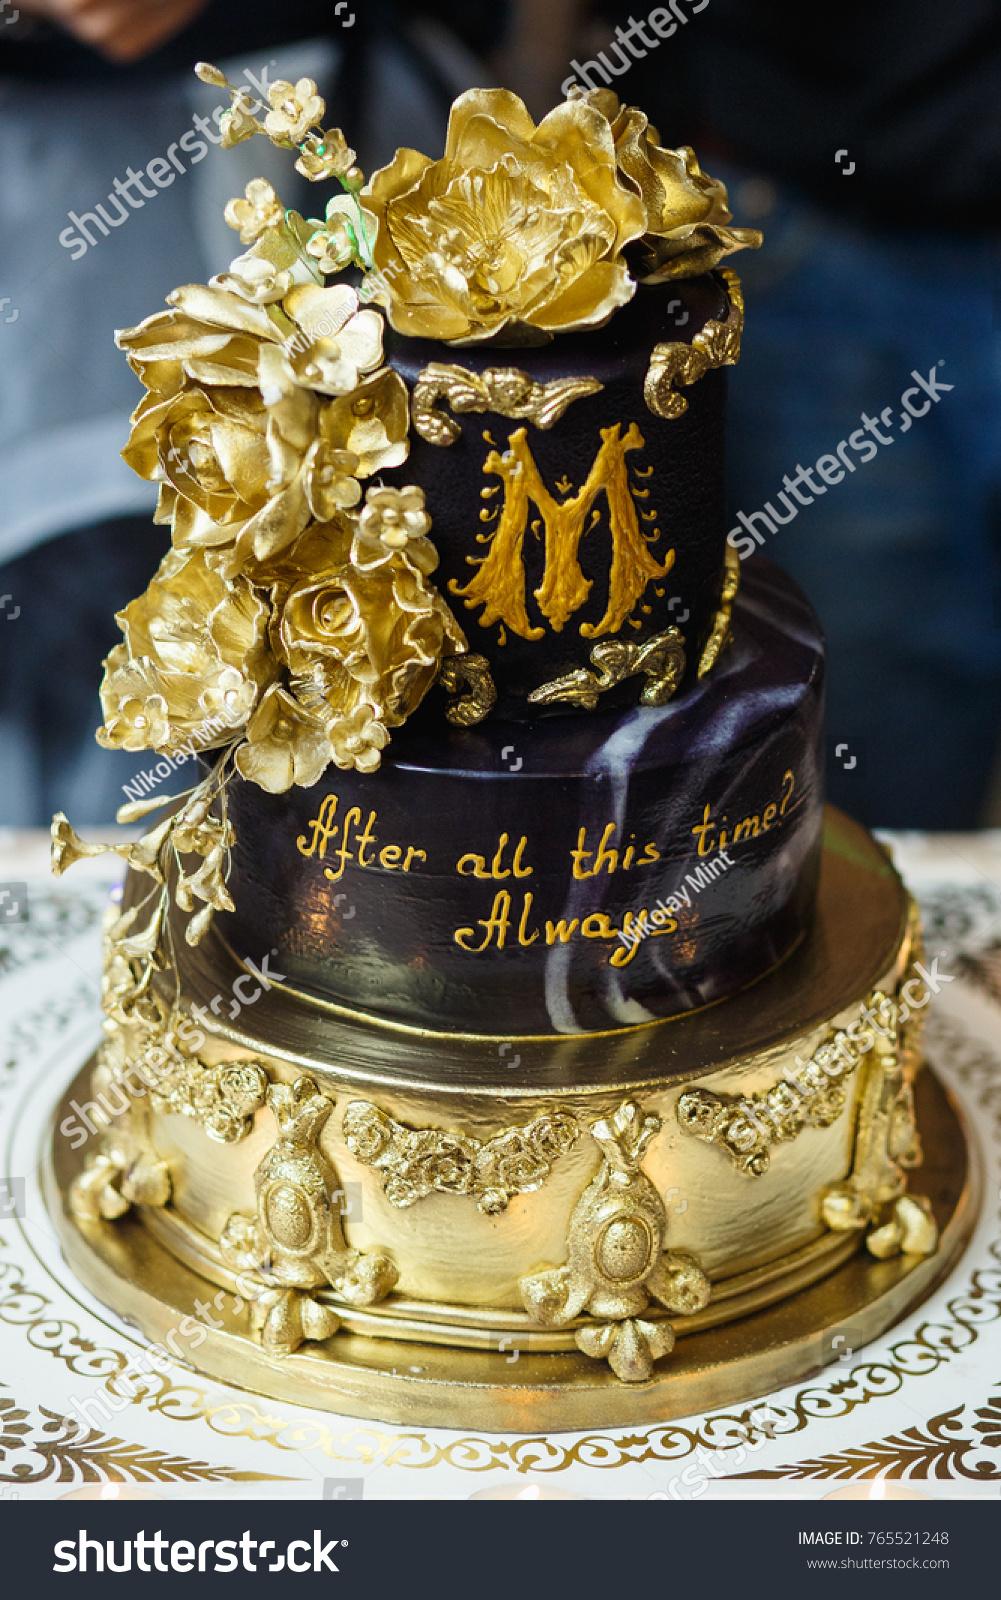 Elegant Black Gold Wedding Cake Stock Photo (Edit Now) 765521248